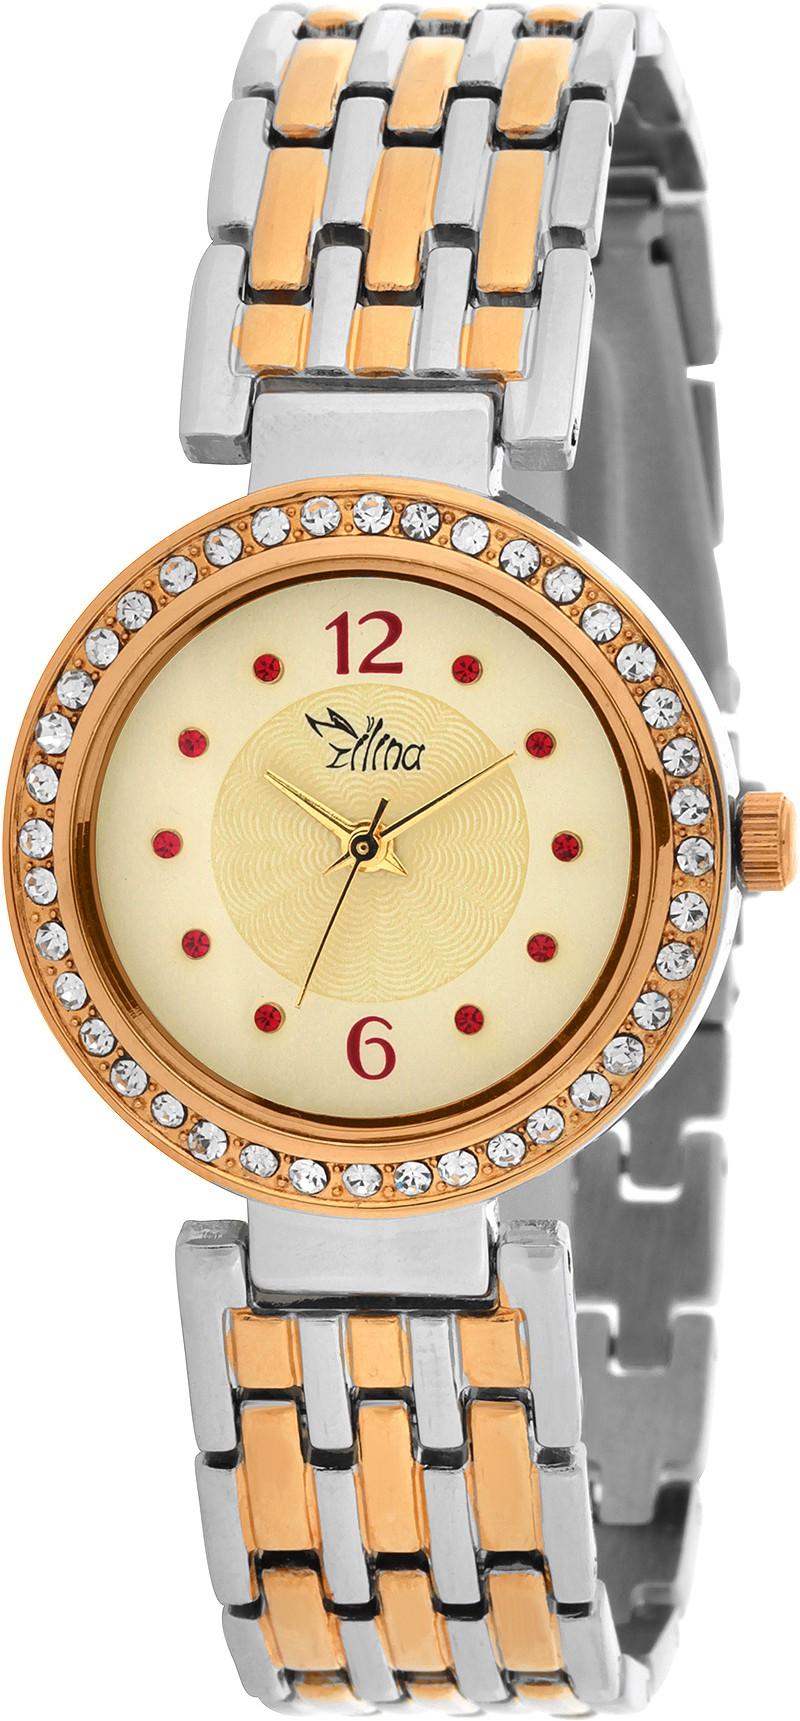 Ilina A1TTRDSTNCH Analog Watch - For Women